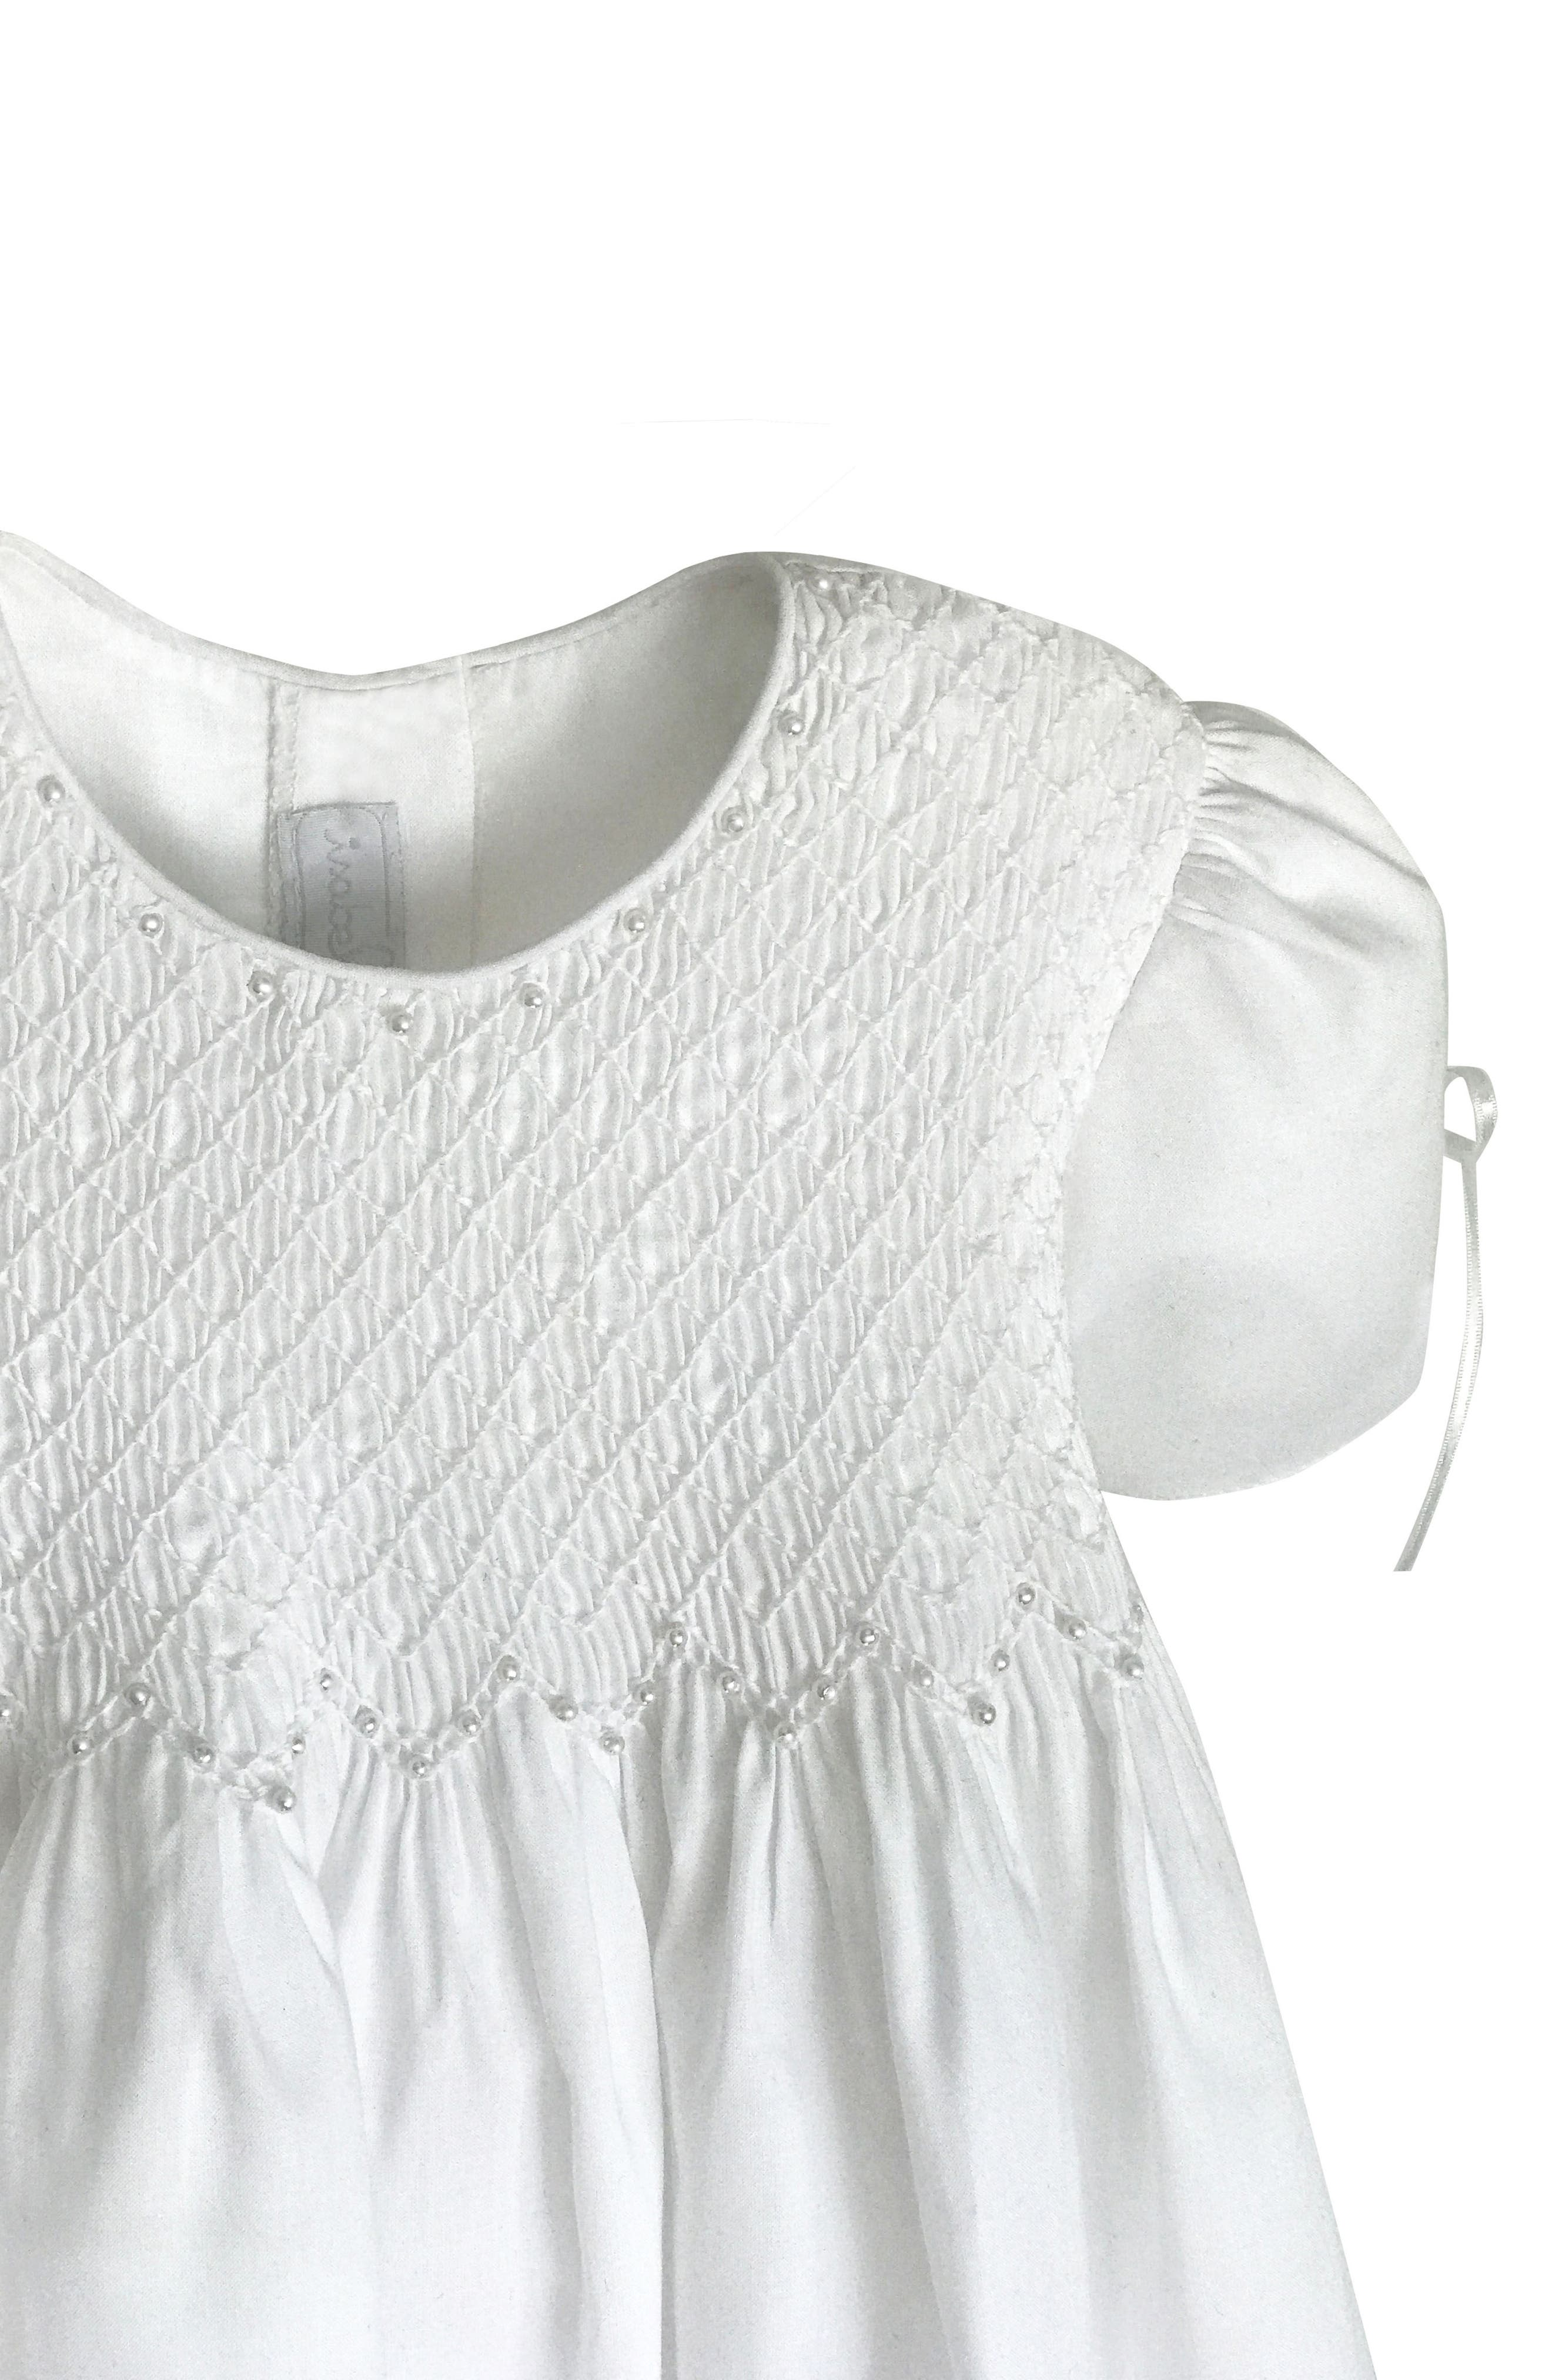 Alternate Image 4  - Isabel Garreton 'Pearls' Christening Gown & Bonnet (Baby)